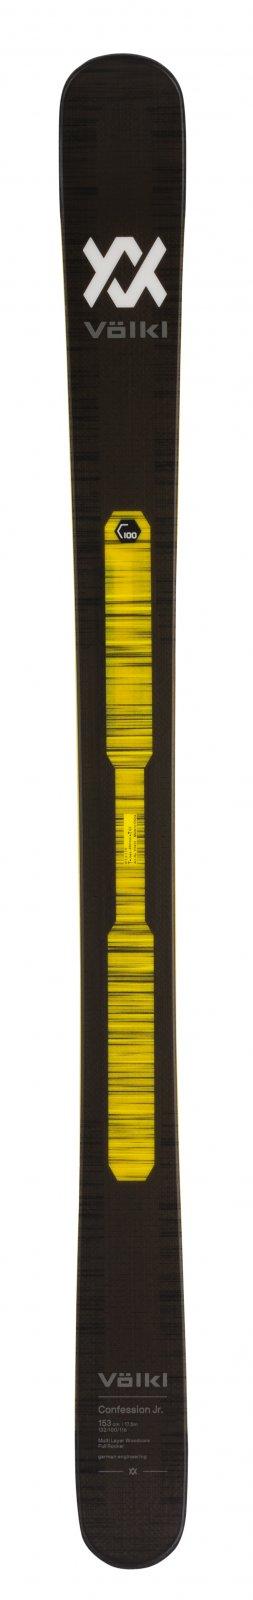 Volkl Confession JR Skis 2020 - size 153cm